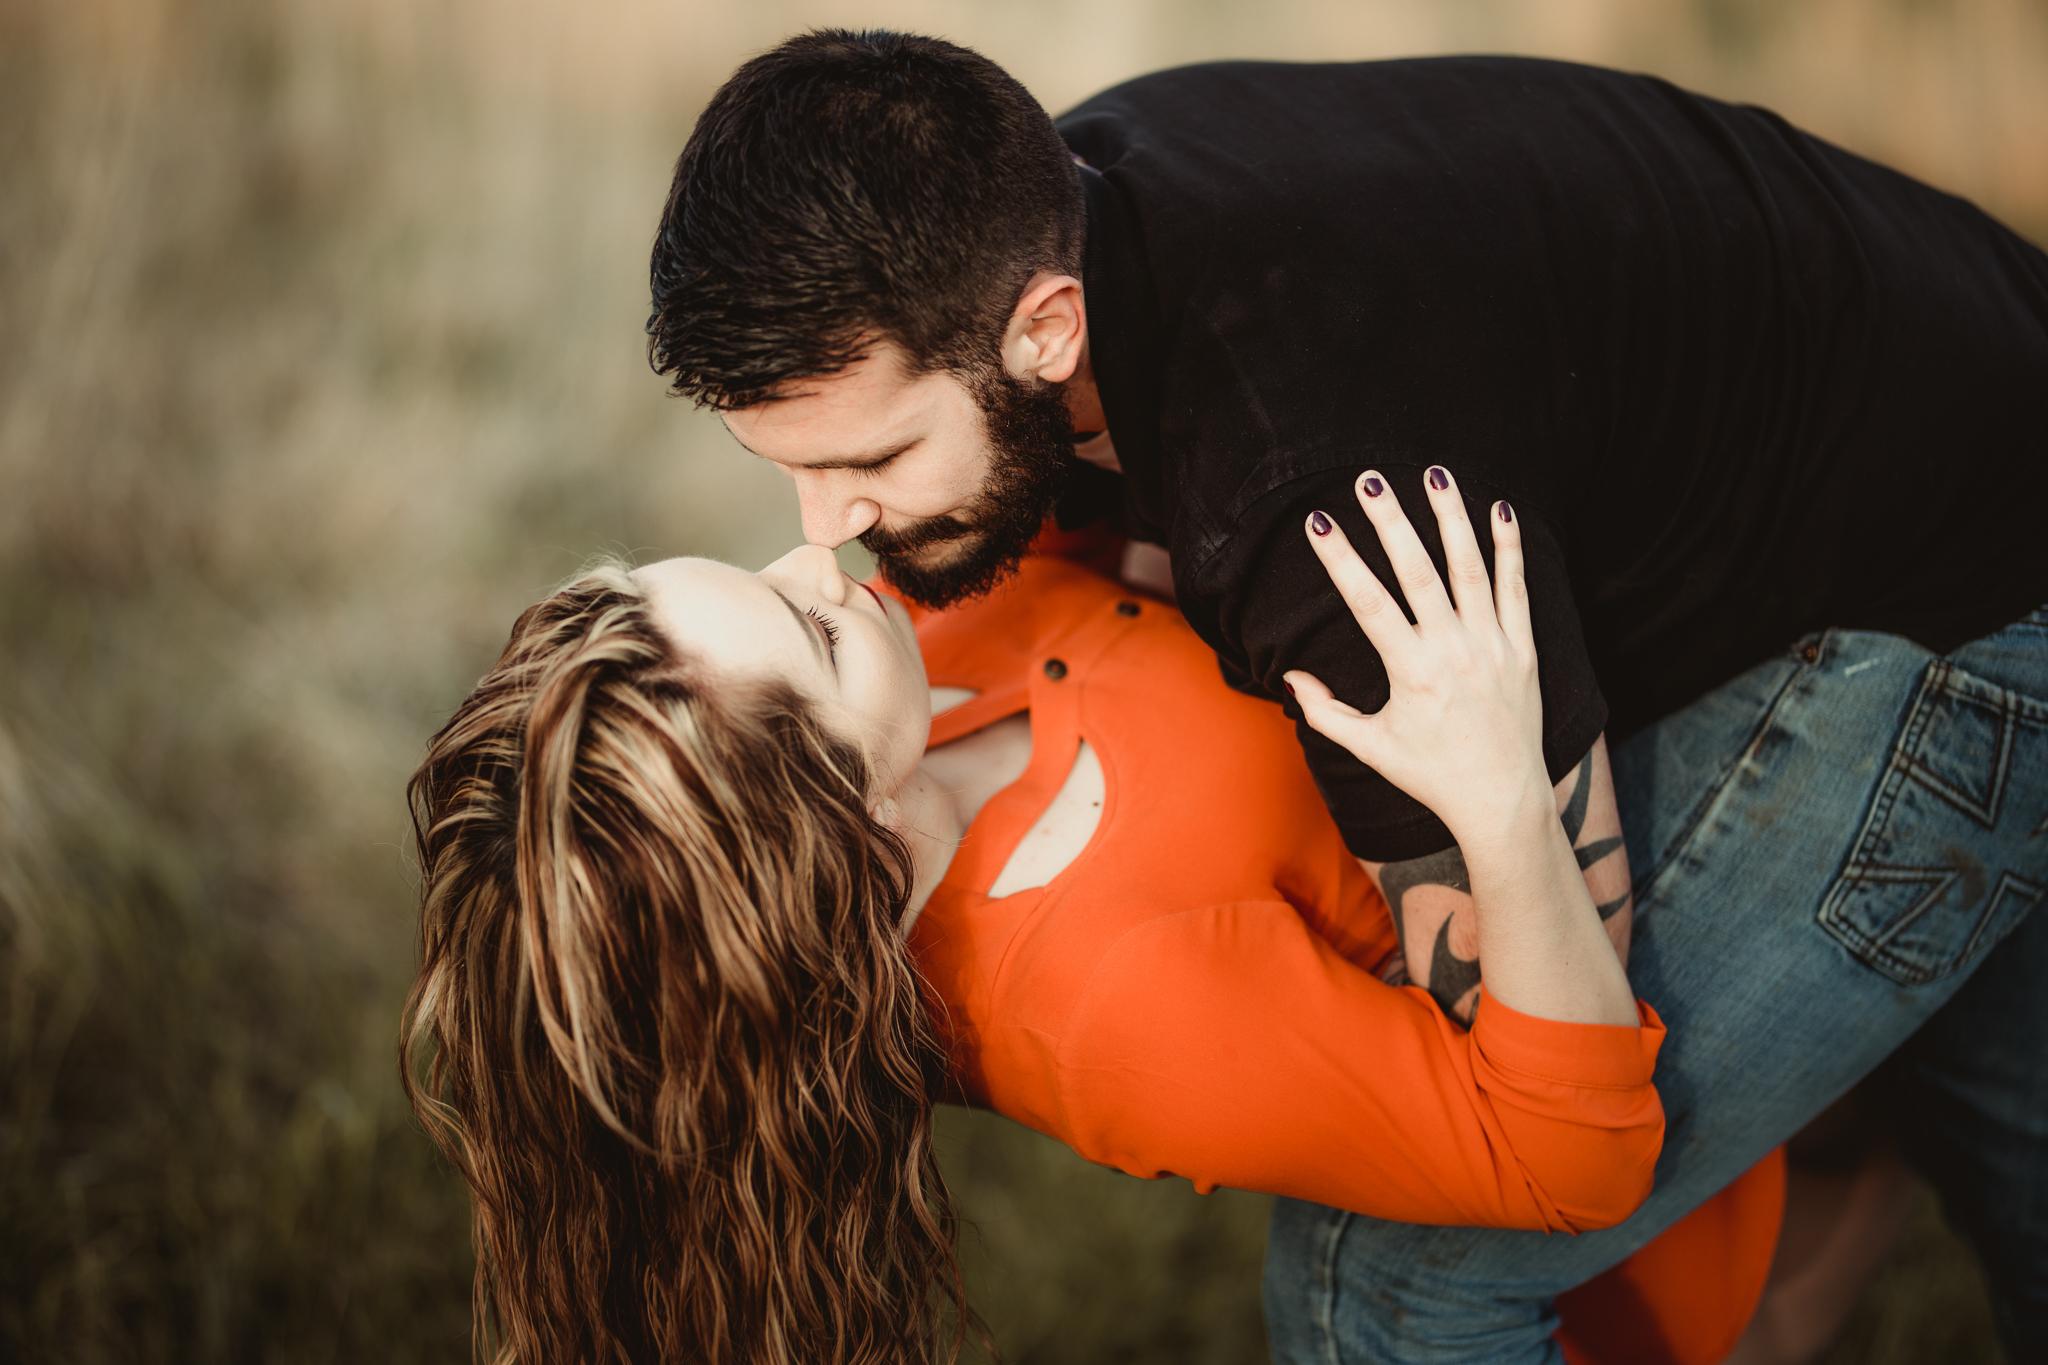 Richmond Kentucky Engagement Photographer - Ariana Jordan Photography -45.jpg